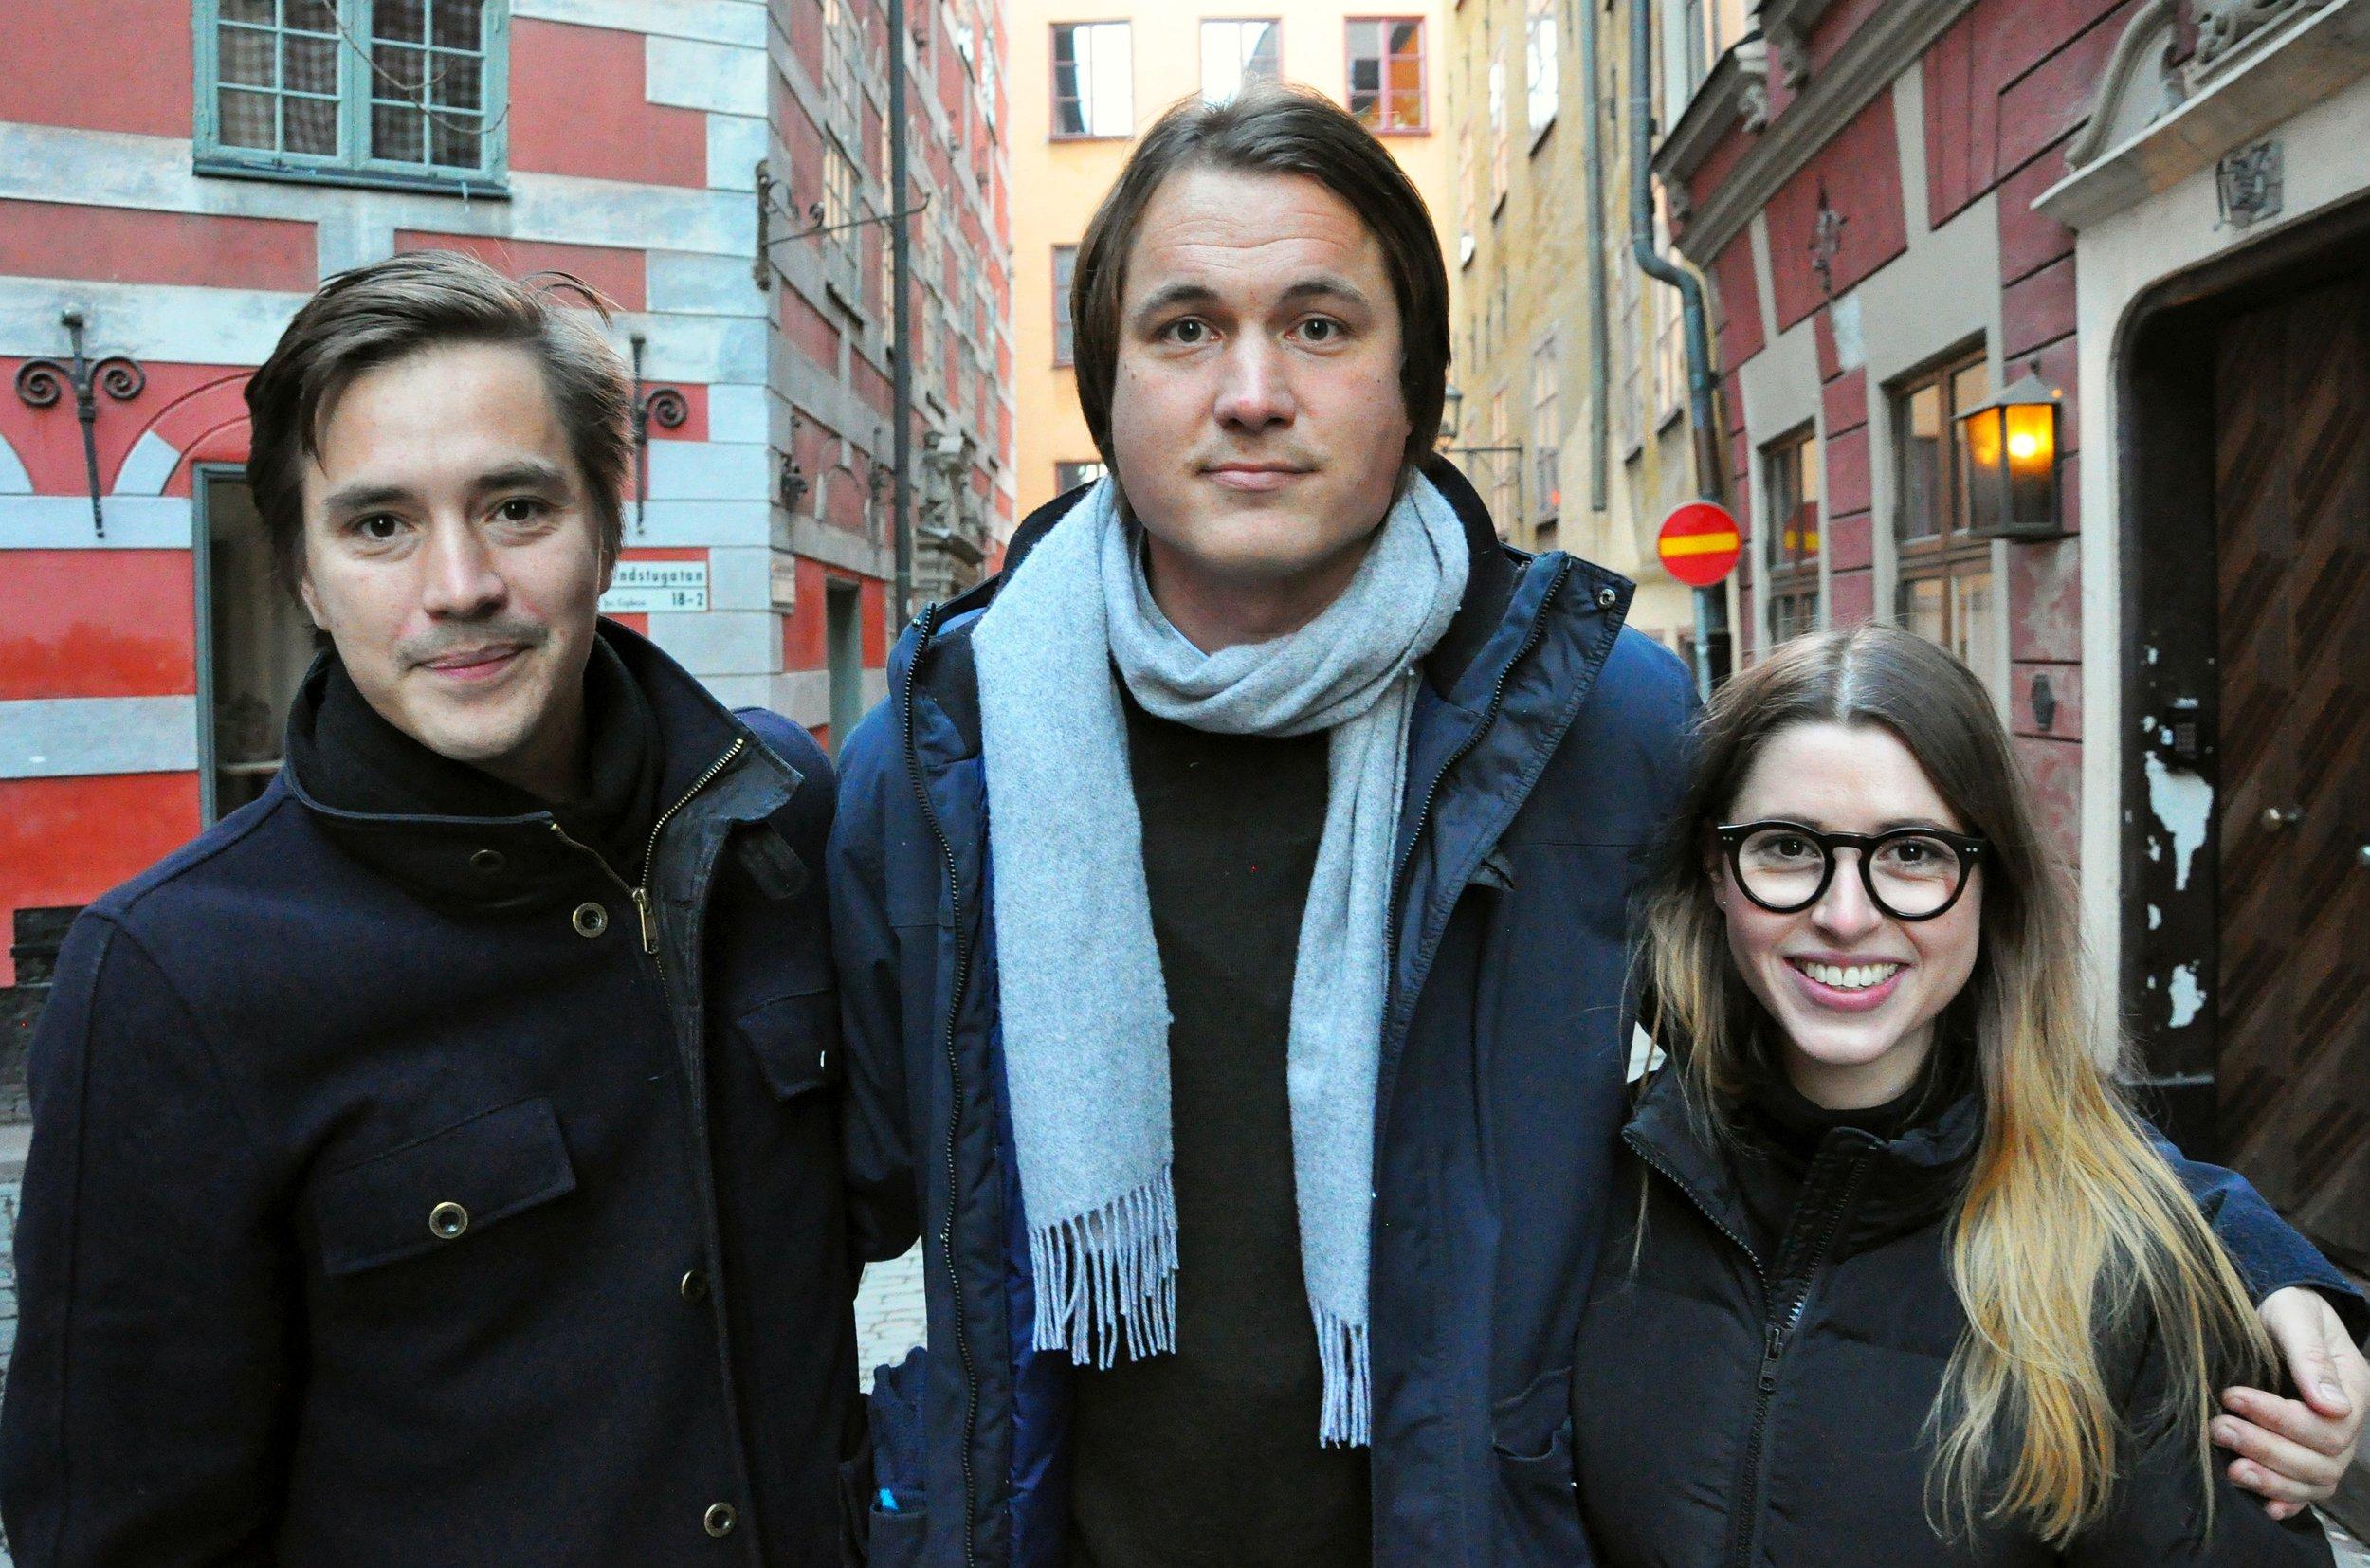 Founders of Grönska: Robin Lee, Petter Olsson & Natalie de Brun Skantz. Picture taken by Hans Kronbrink.